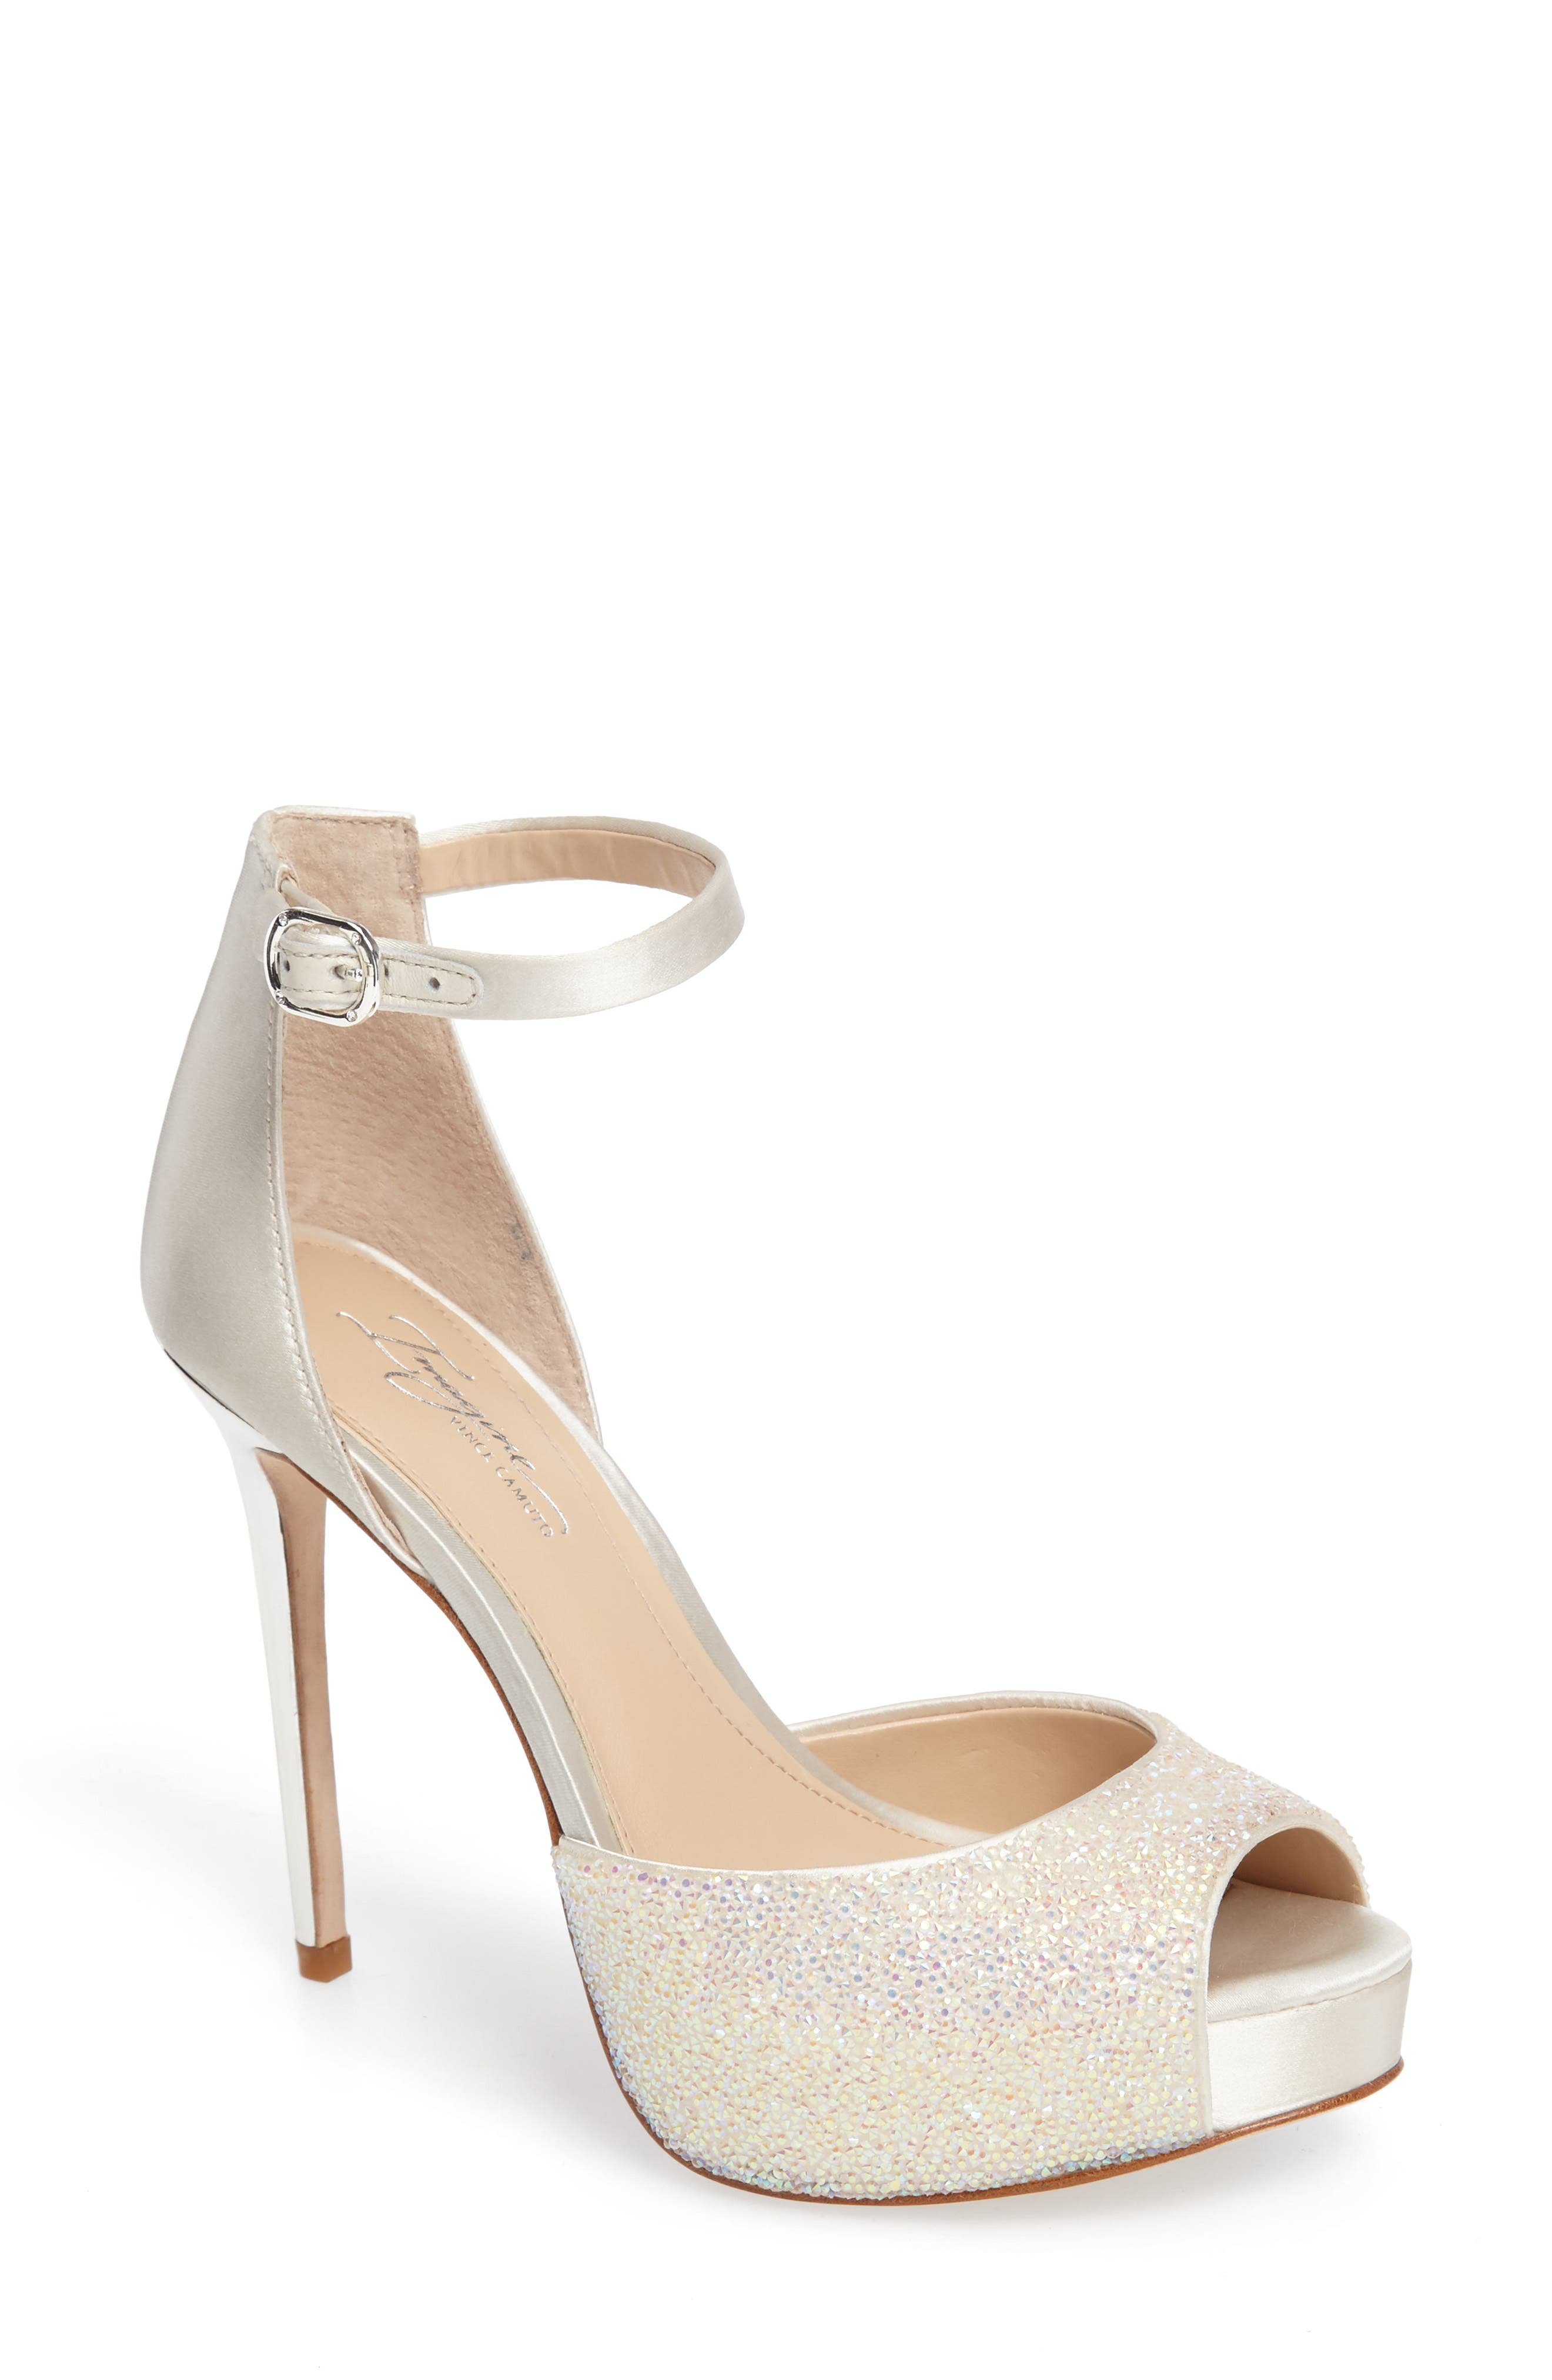 Main Image - Imagine by Vince Camuto Karleigh Platform Sandal (Women)